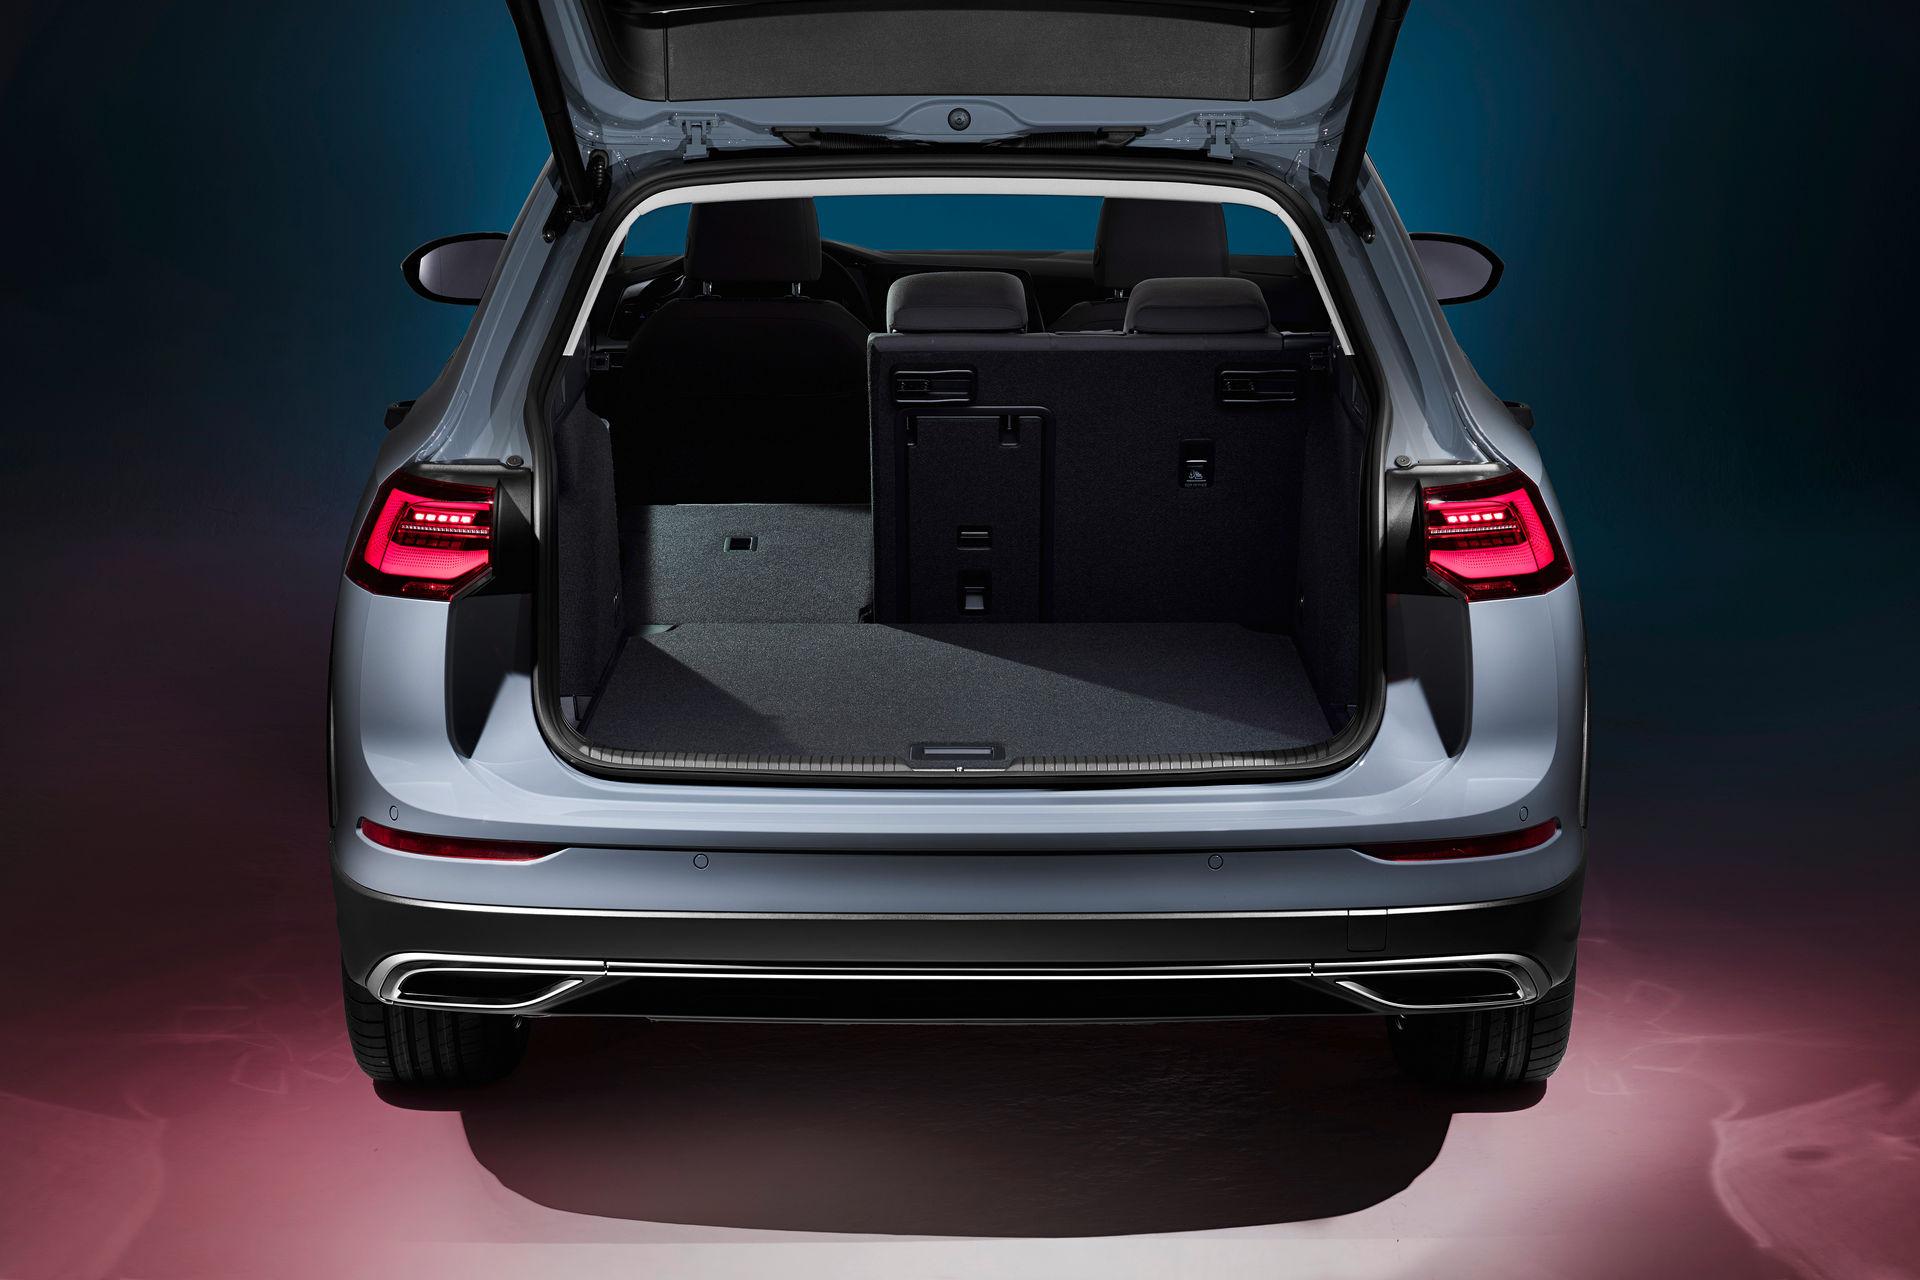 VW-Golf-Estate-And-Golf-Alltrack-8